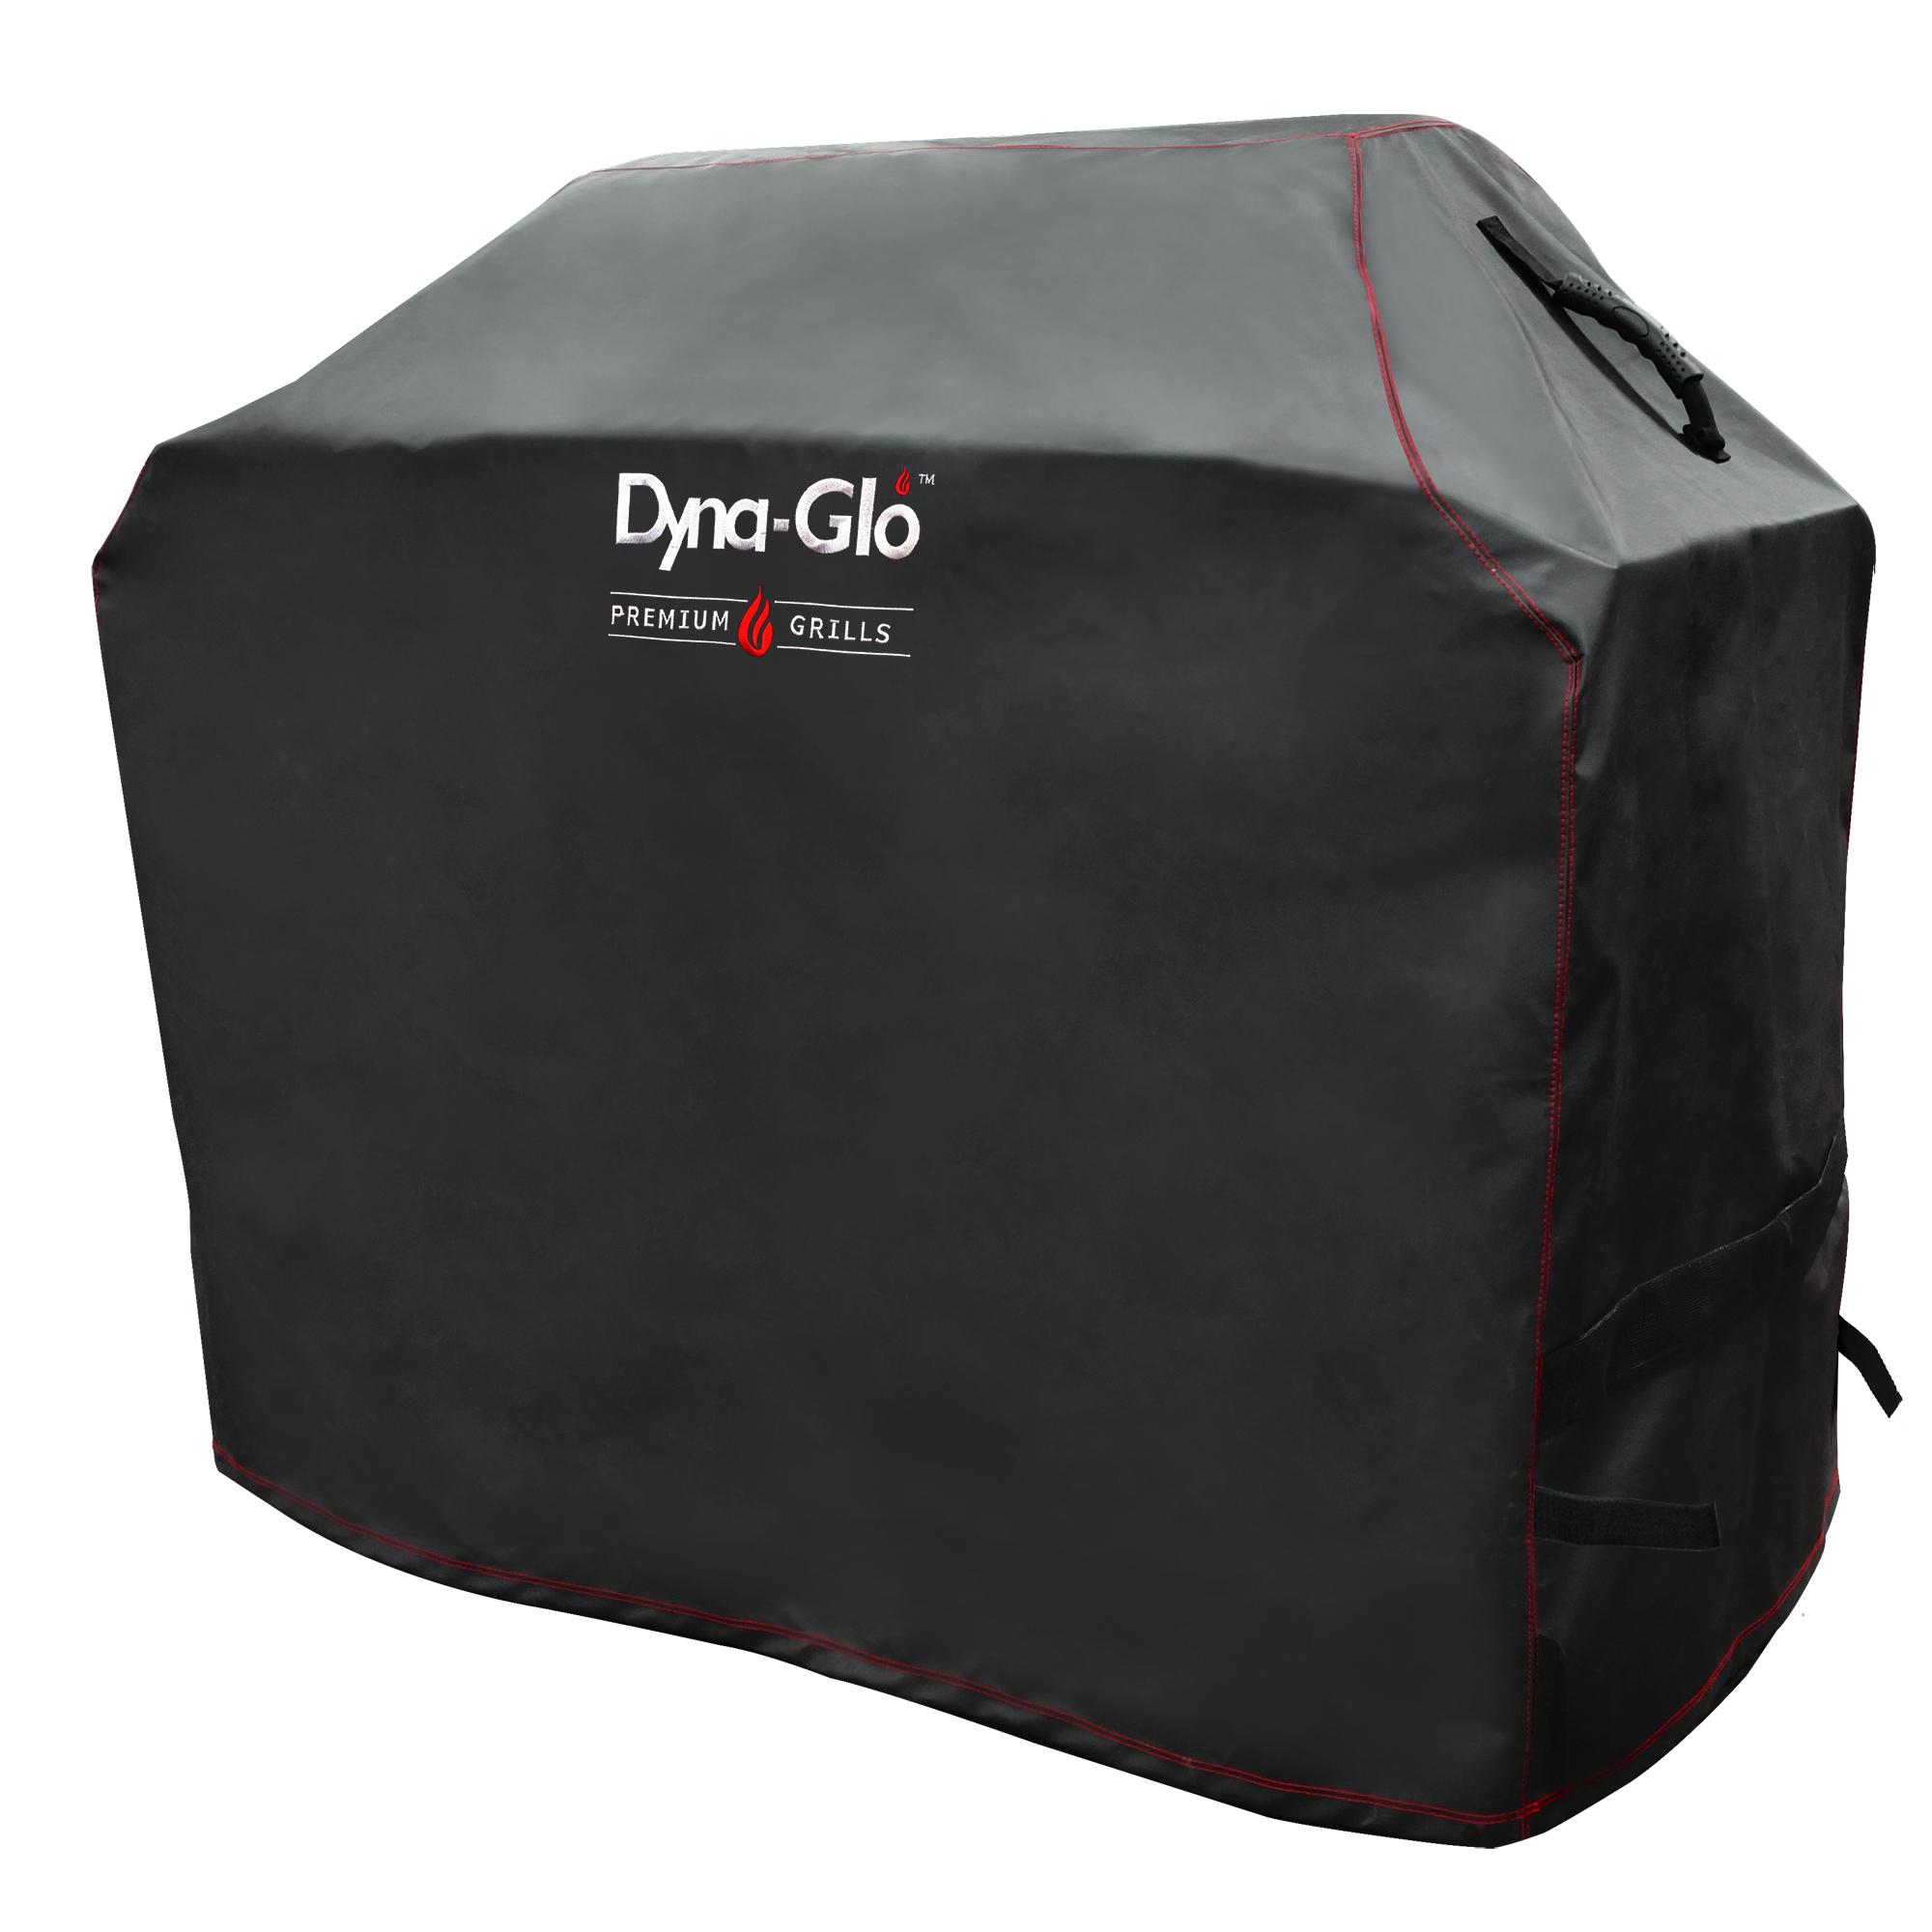 Dyna-Glo Premium 4 Burner Gas Grill Cover